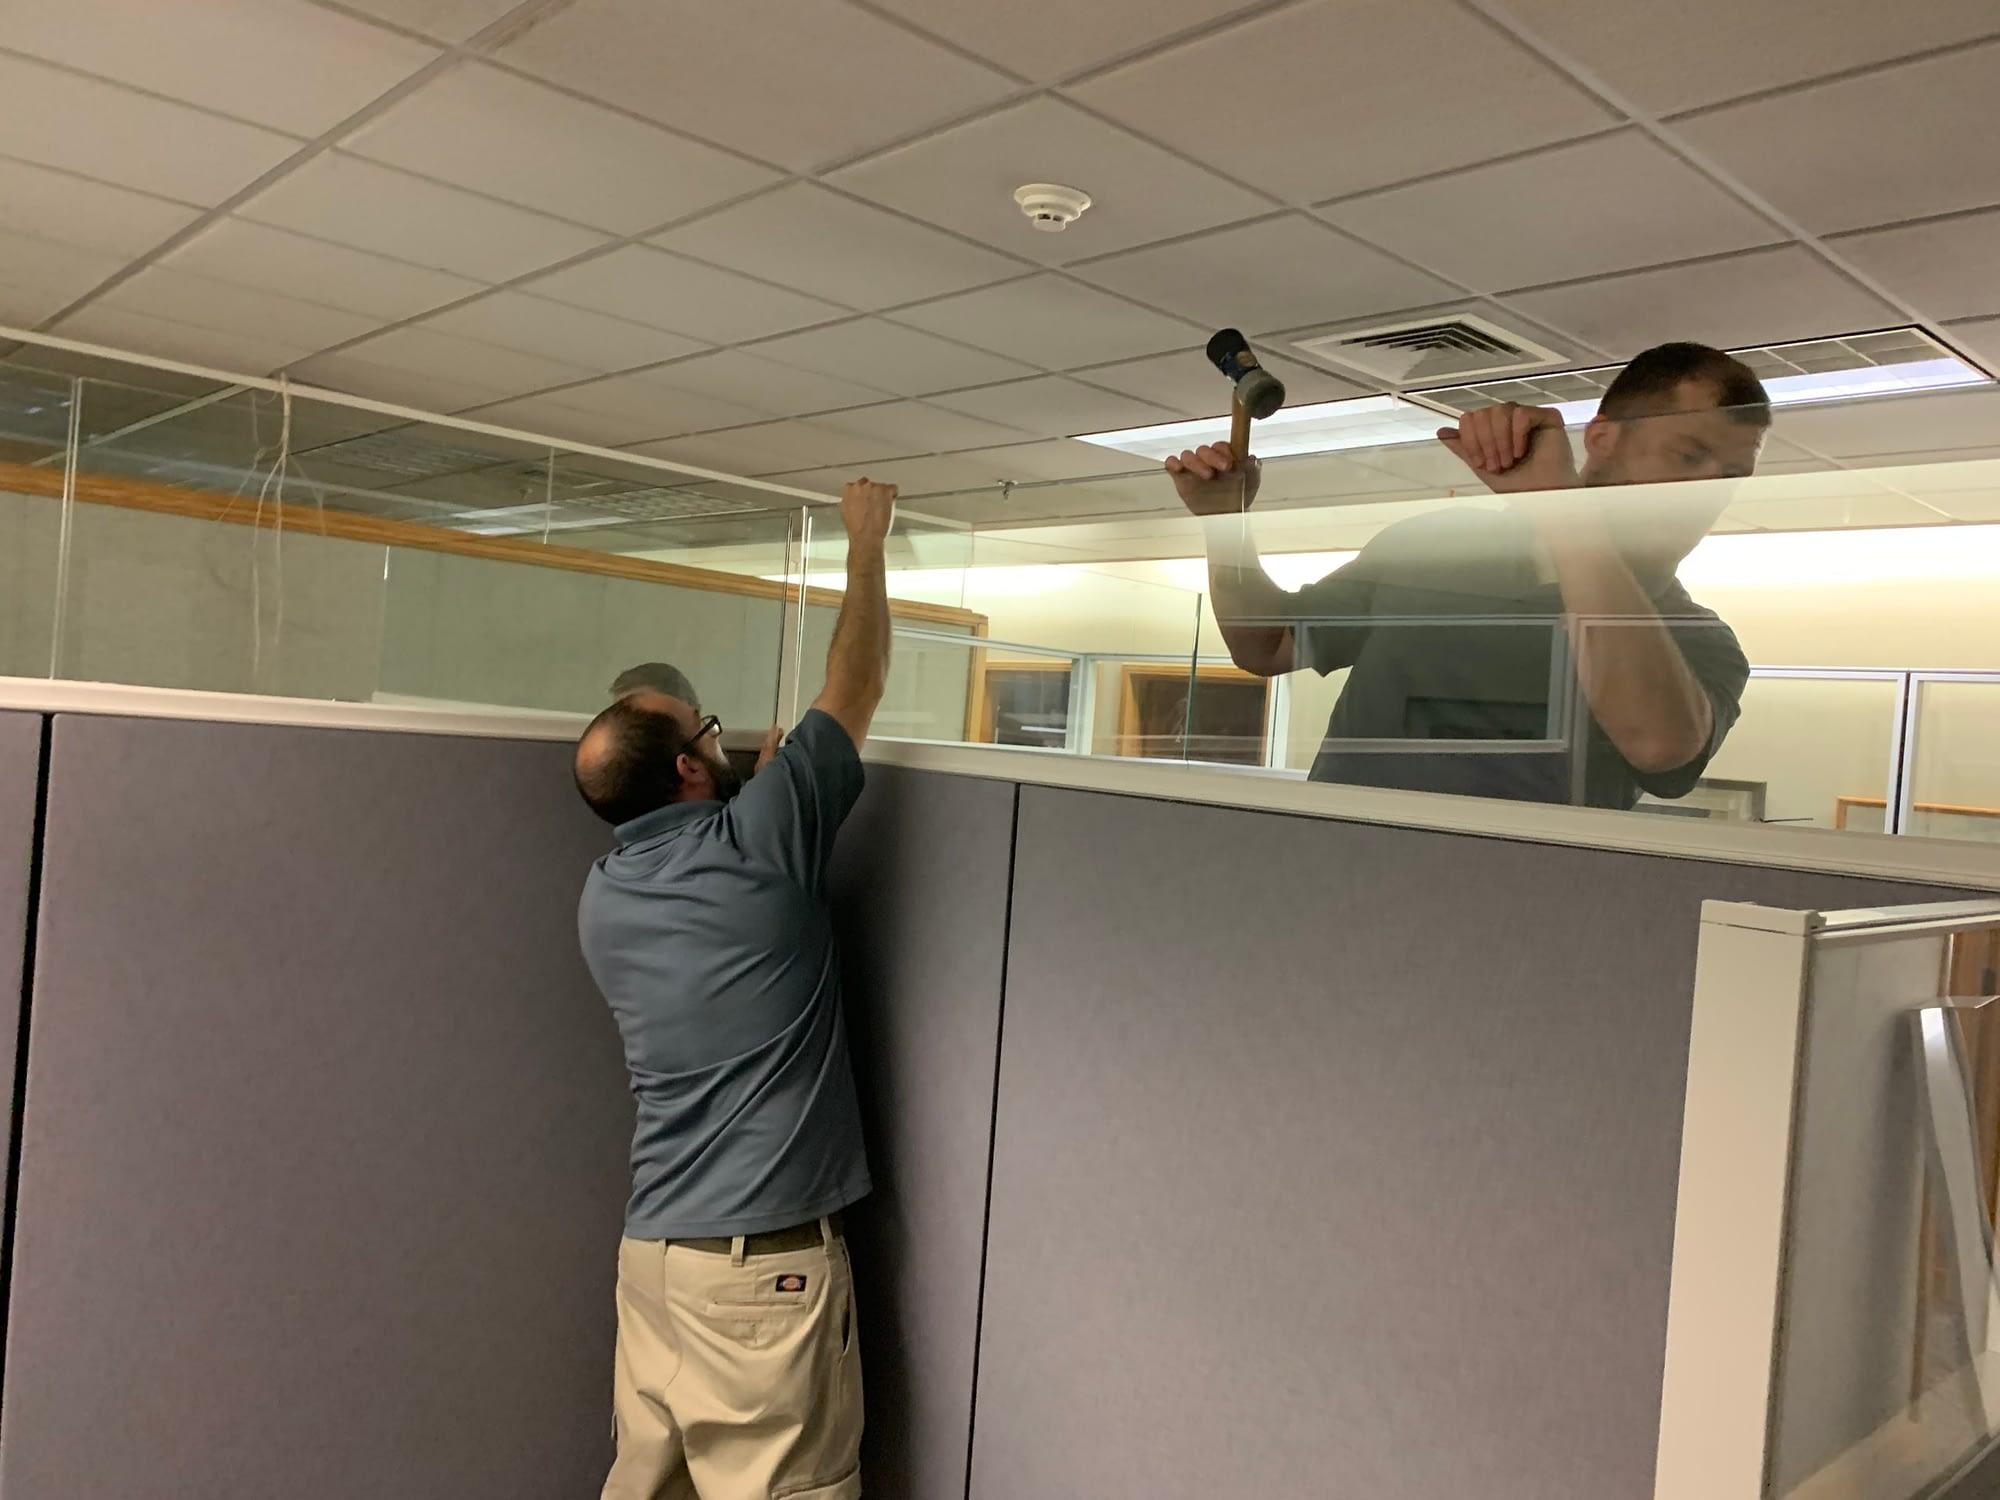 installers assembling workstations